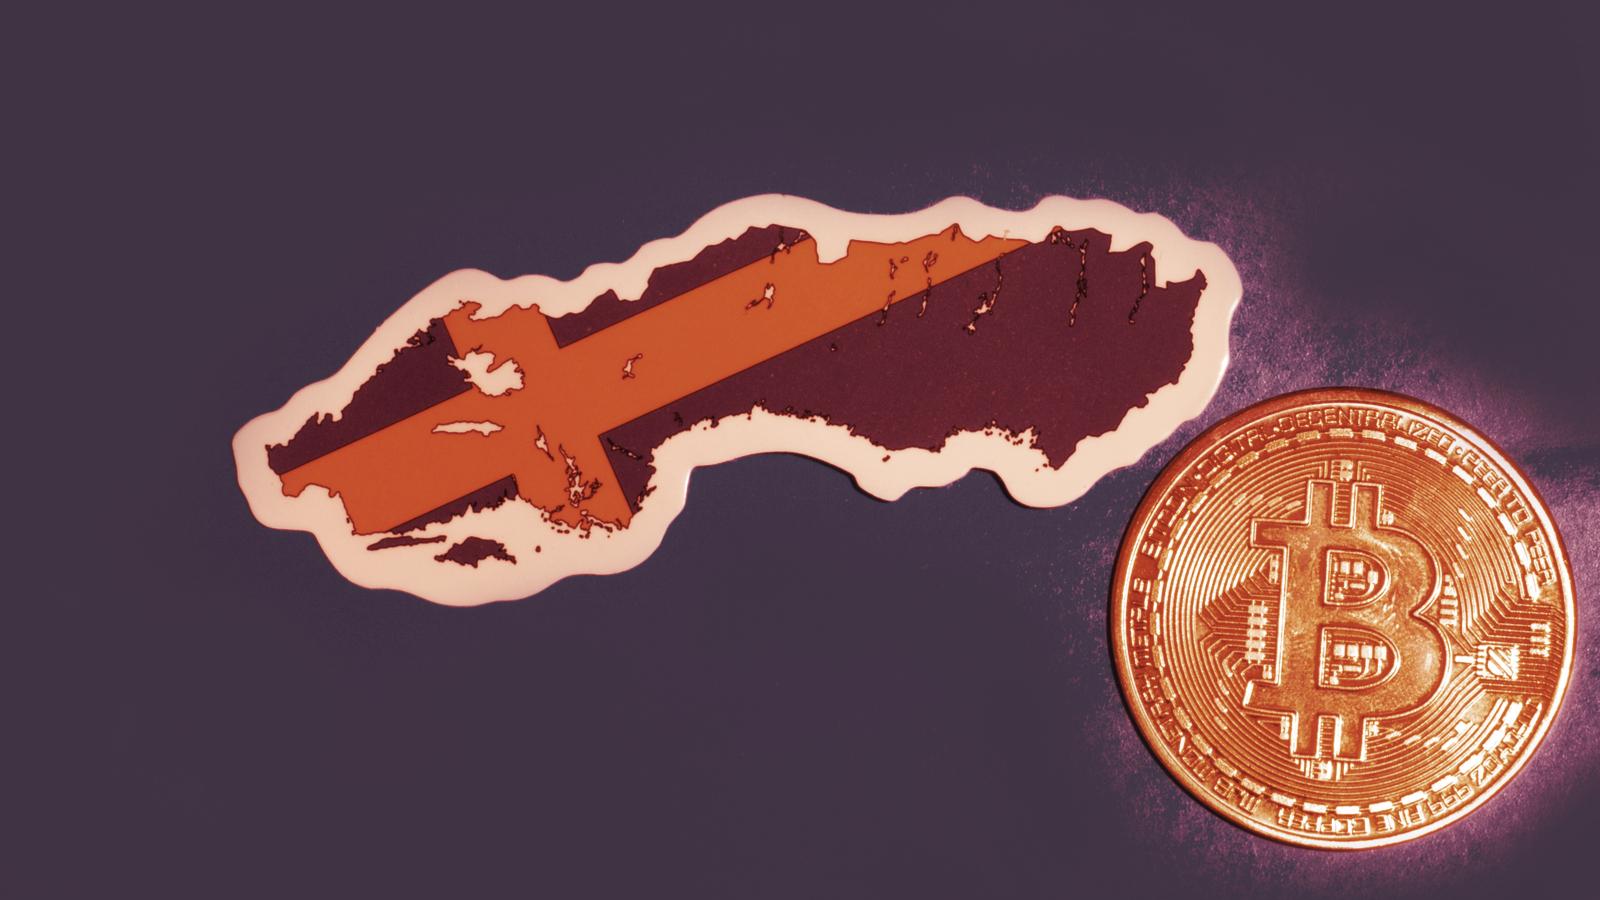 Swedish Government Returns Over $1 Million in Bitcoin to Drug Dealer